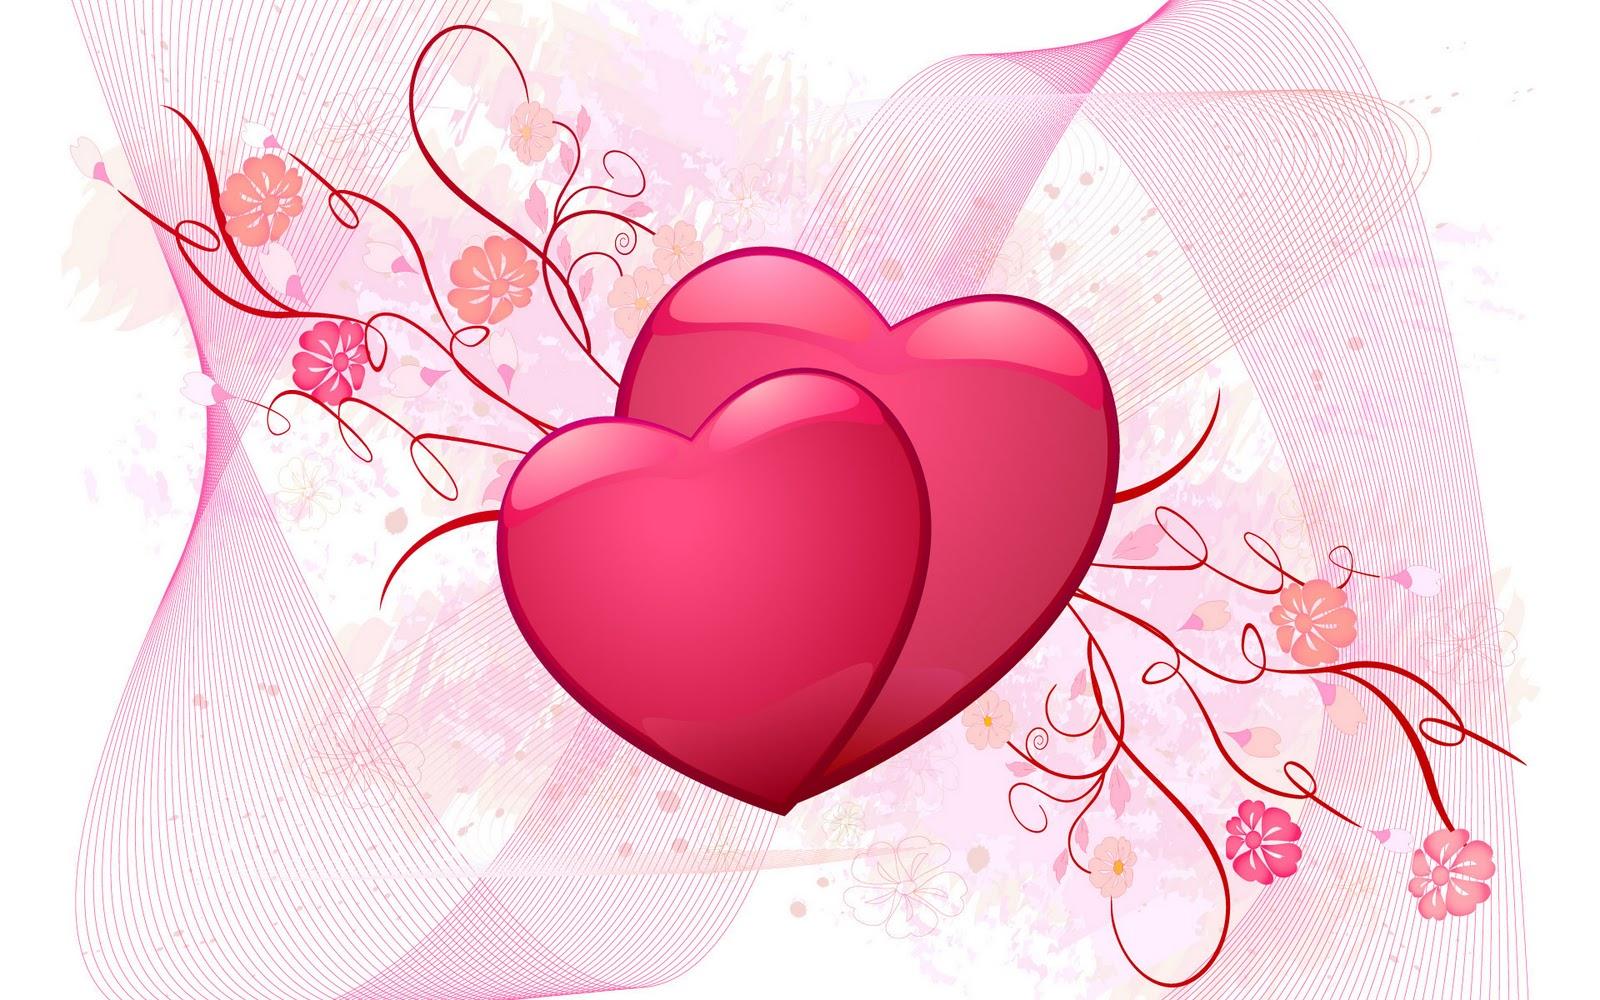 http://4.bp.blogspot.com/_FlTuEyj8ZMA/TPddcN0TkDI/AAAAAAAAACg/HI02GF-NhiM/s1600/Love-wallpaper-love-4187609-1920-1200.jpg